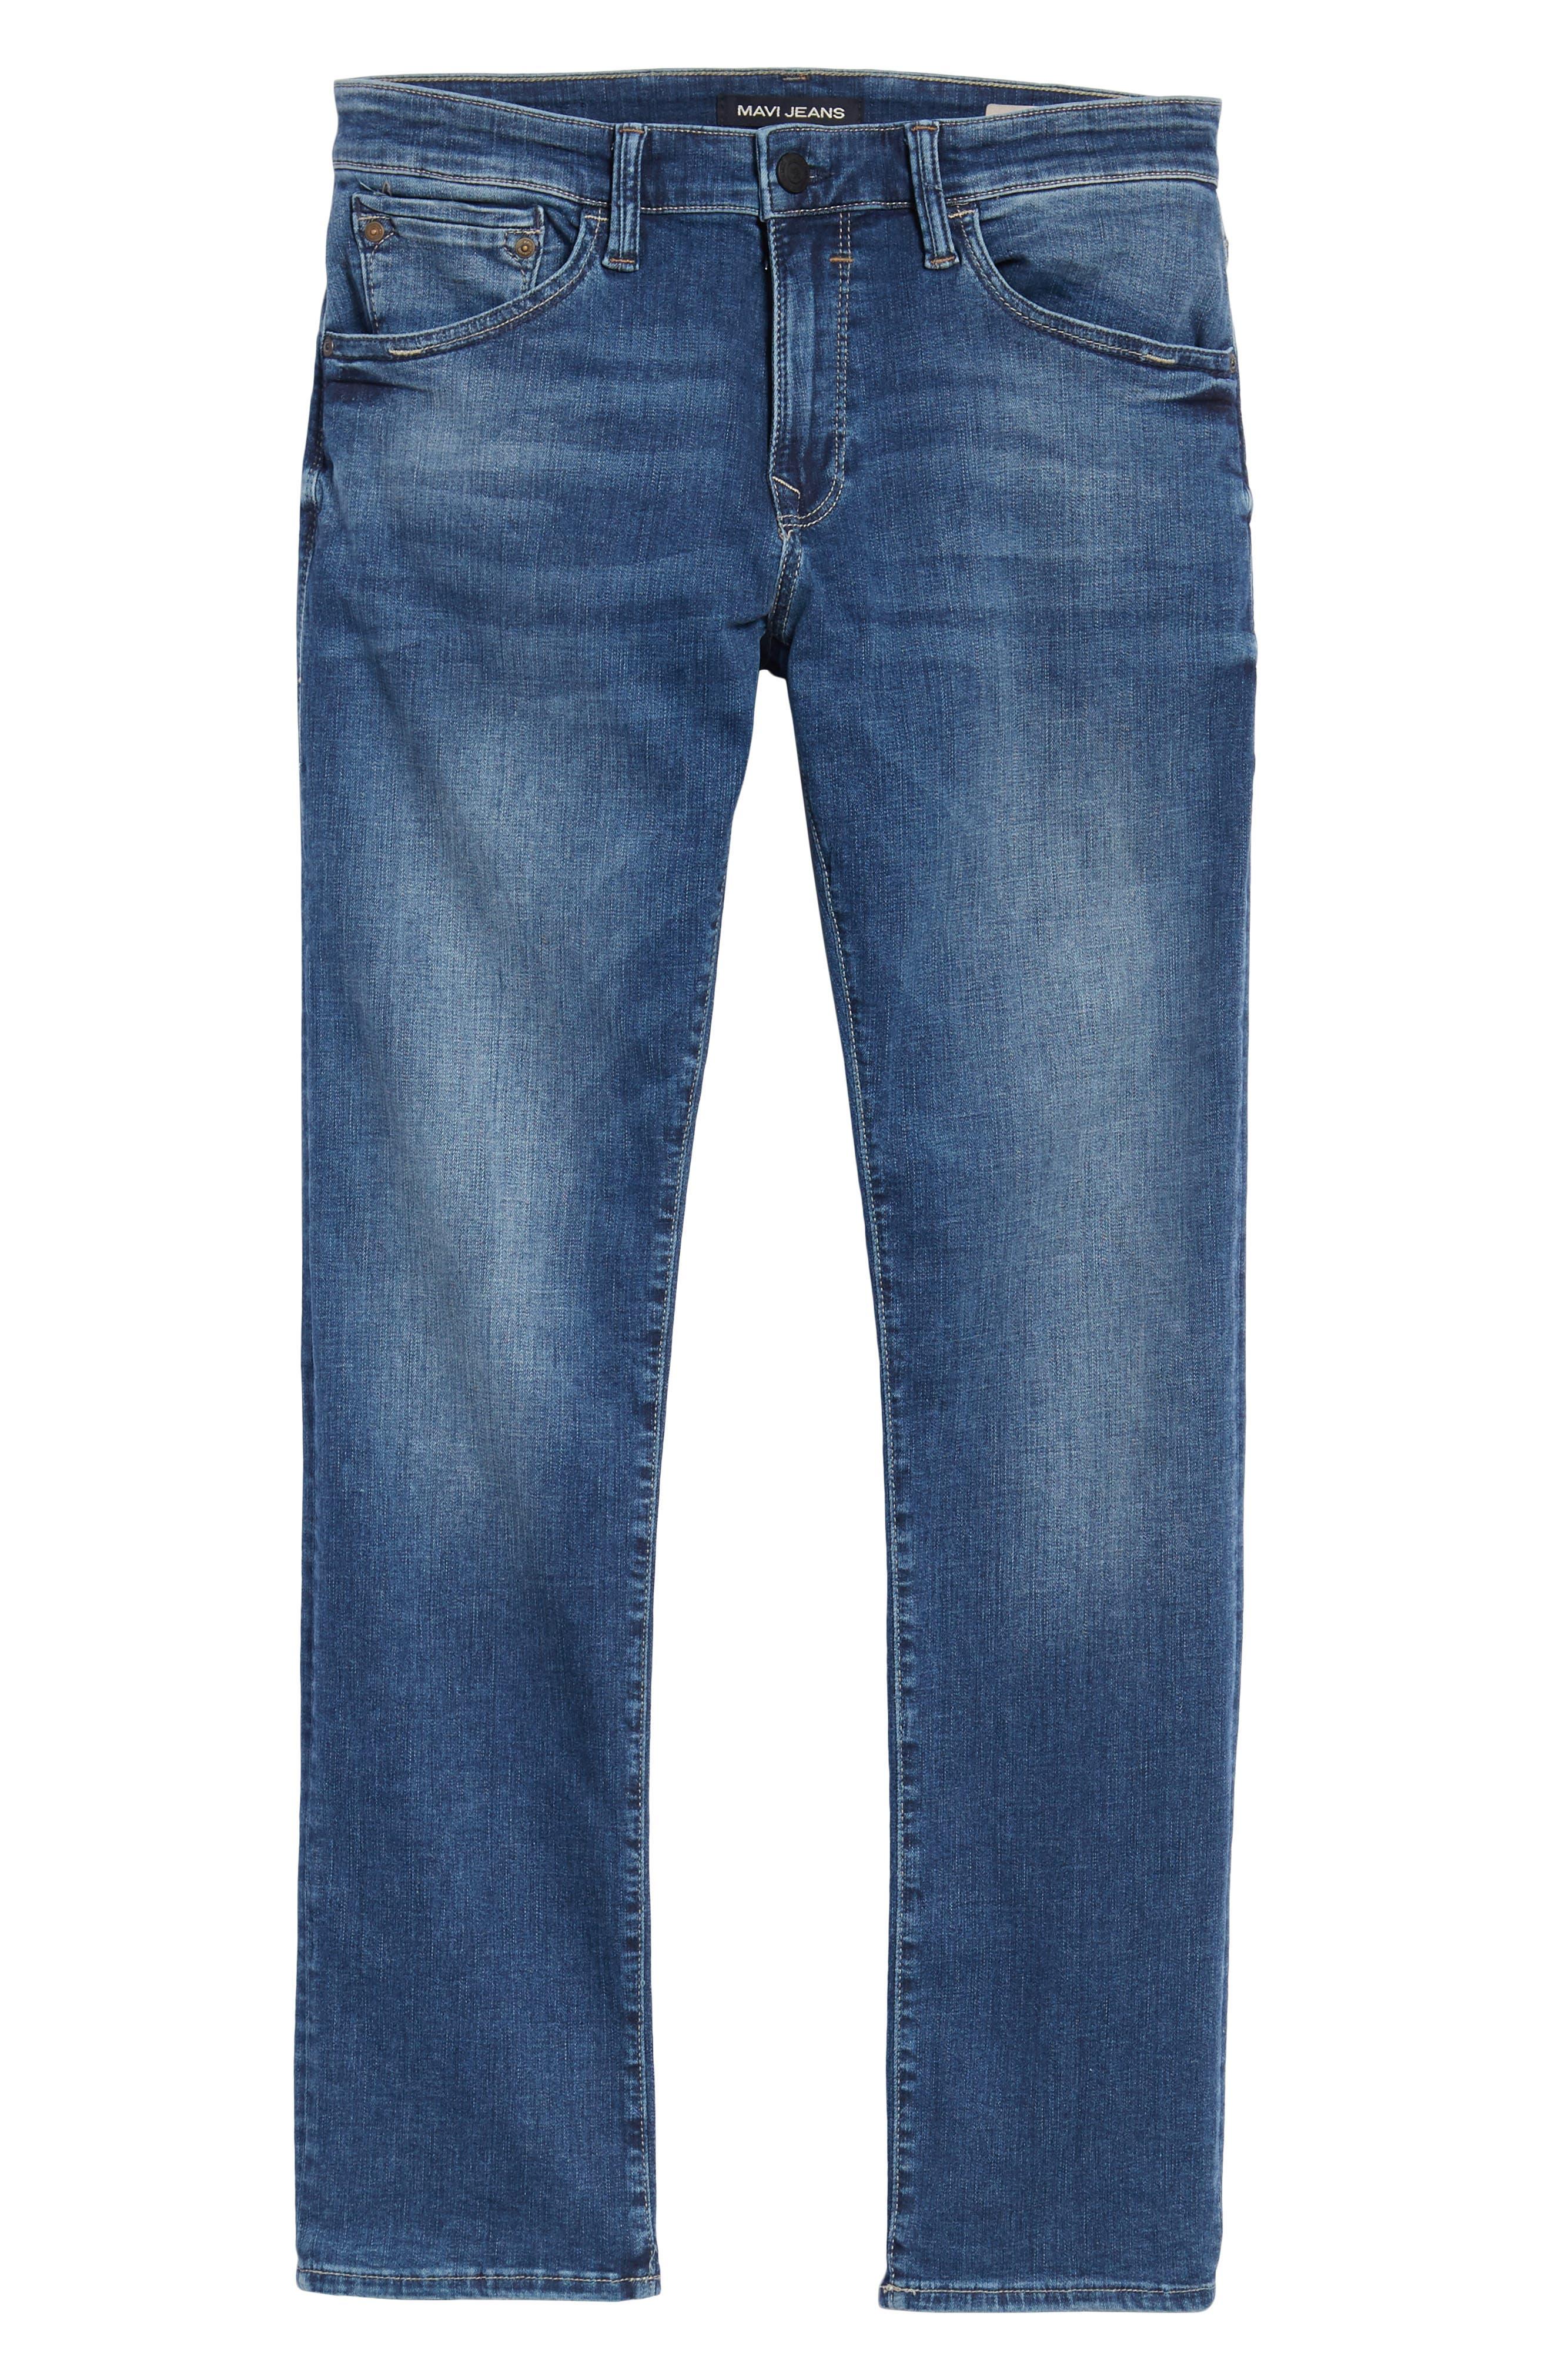 Zach Straight Leg Jeans,                             Alternate thumbnail 6, color,                             Indigo Cashmere